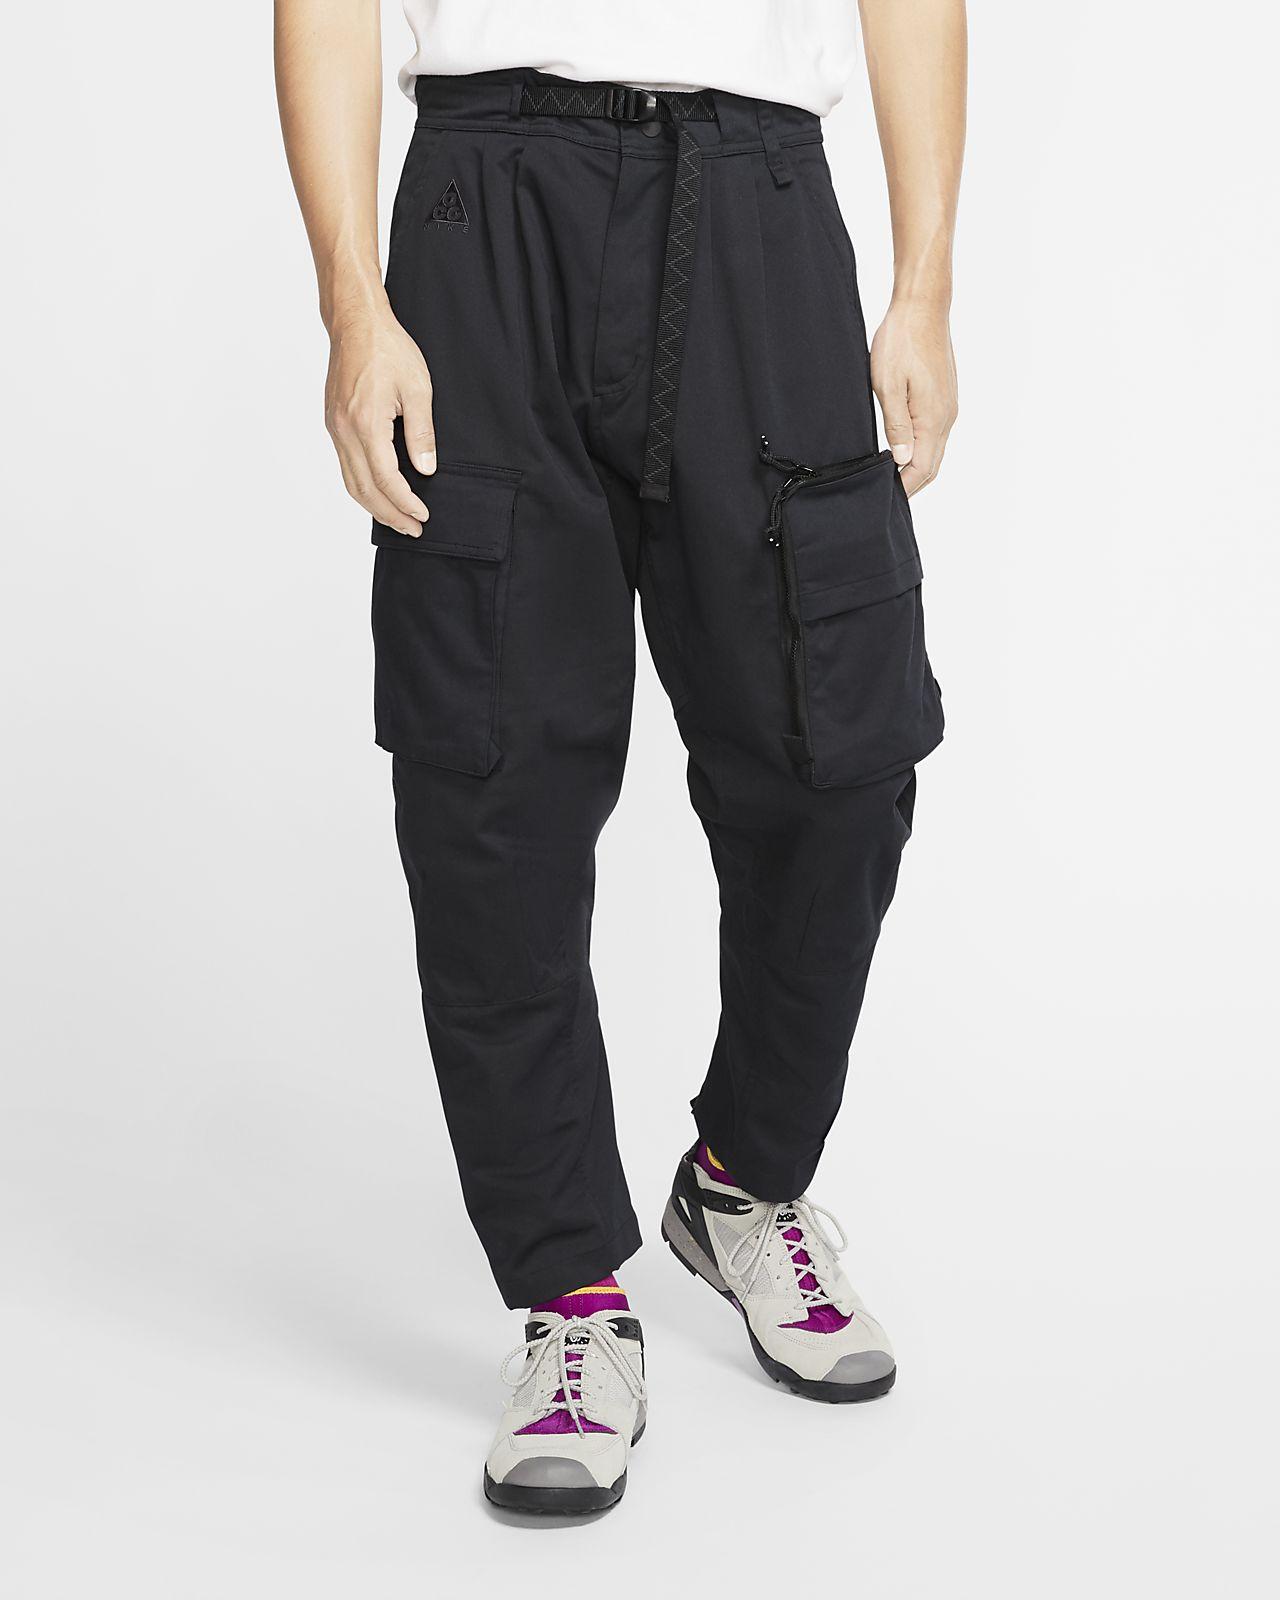 Мужские брюки карго из тканого материала Nike ACG